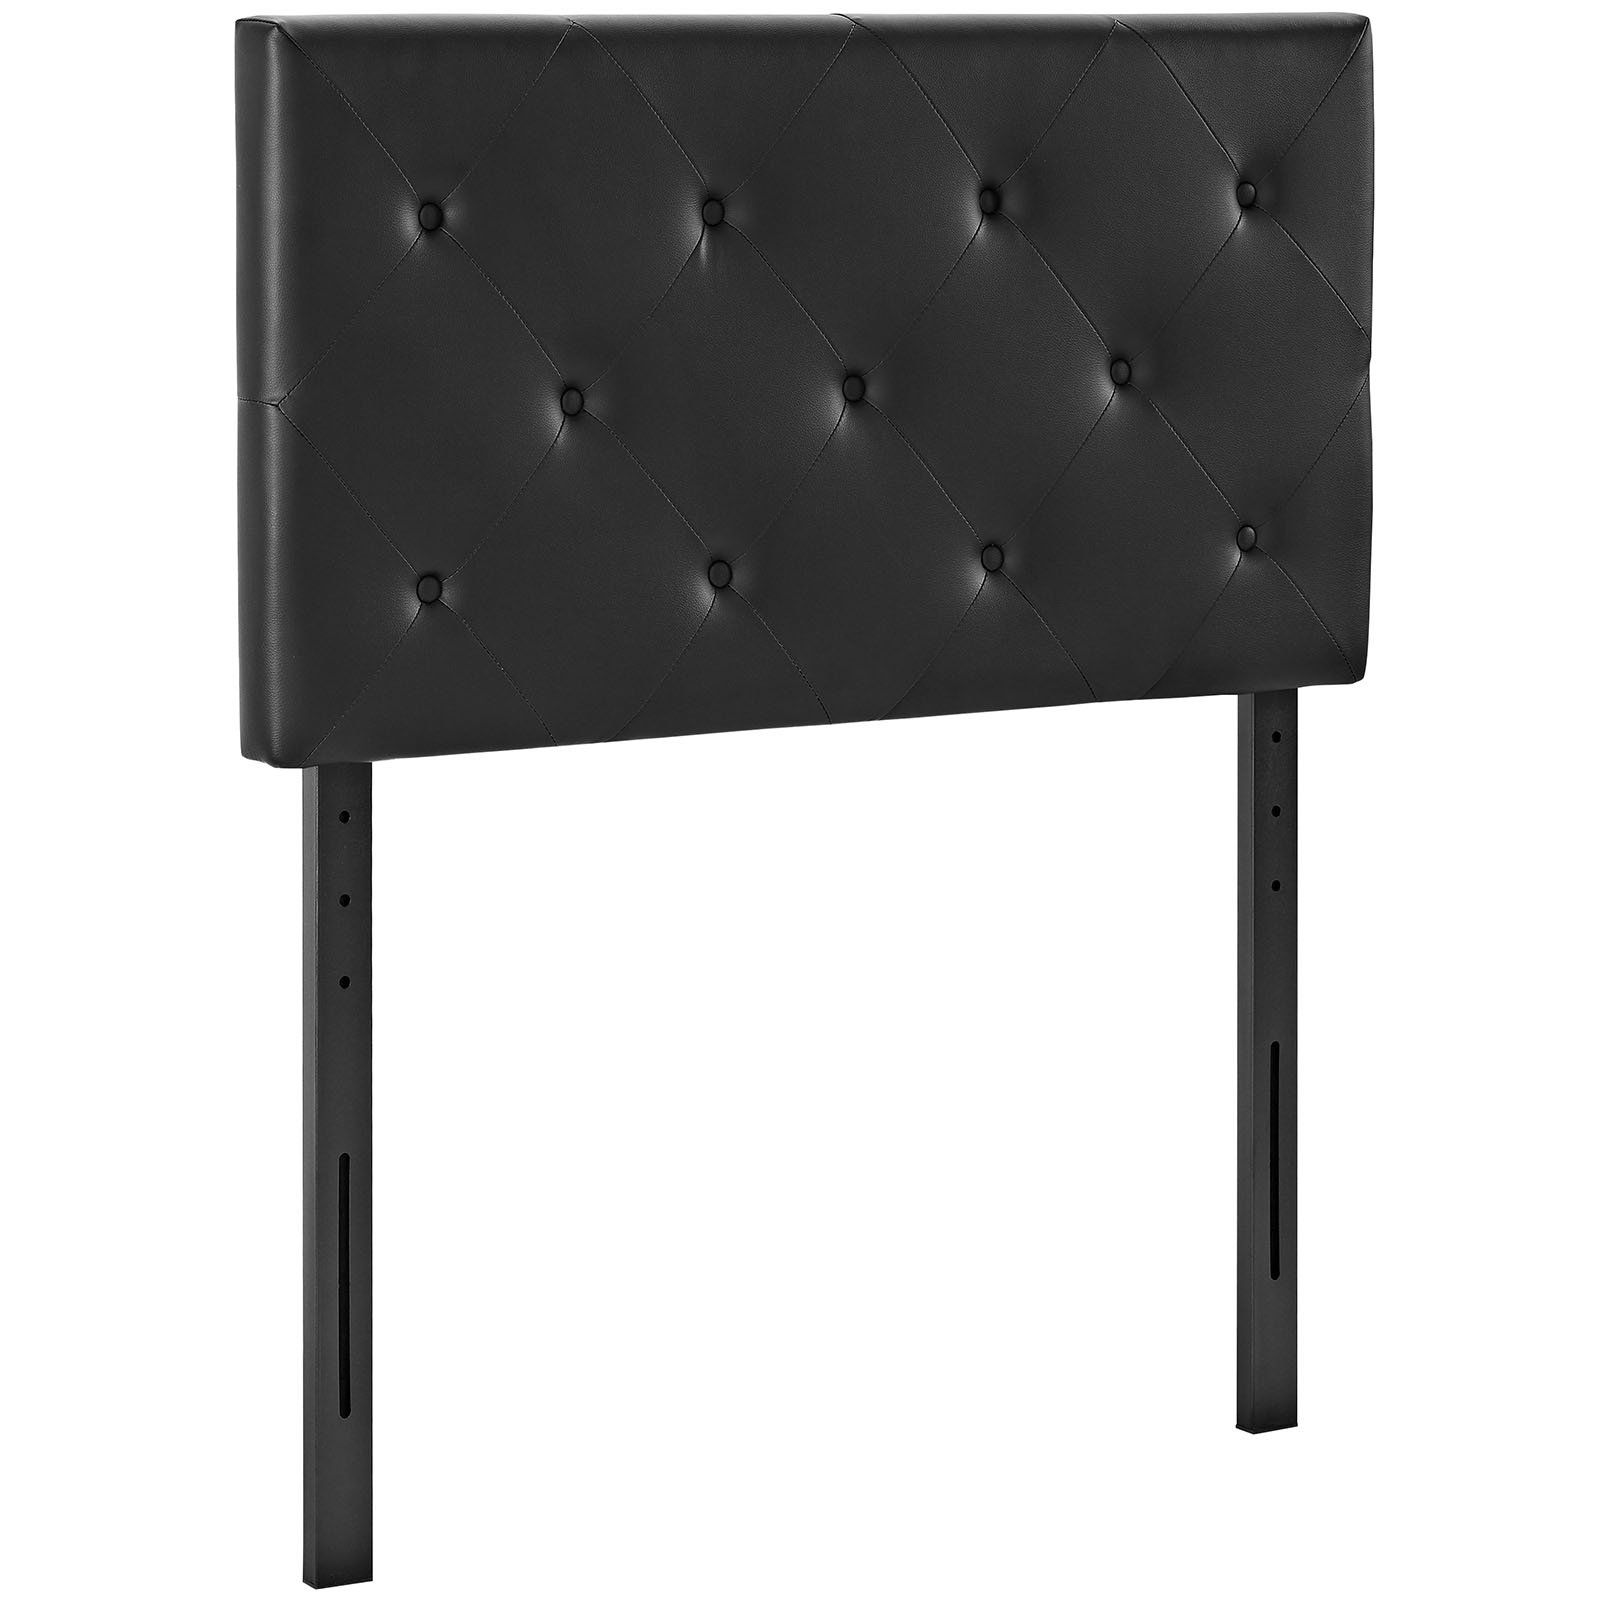 Modway Terisa Tufted Faux Leather Twin Size Headboard in Black